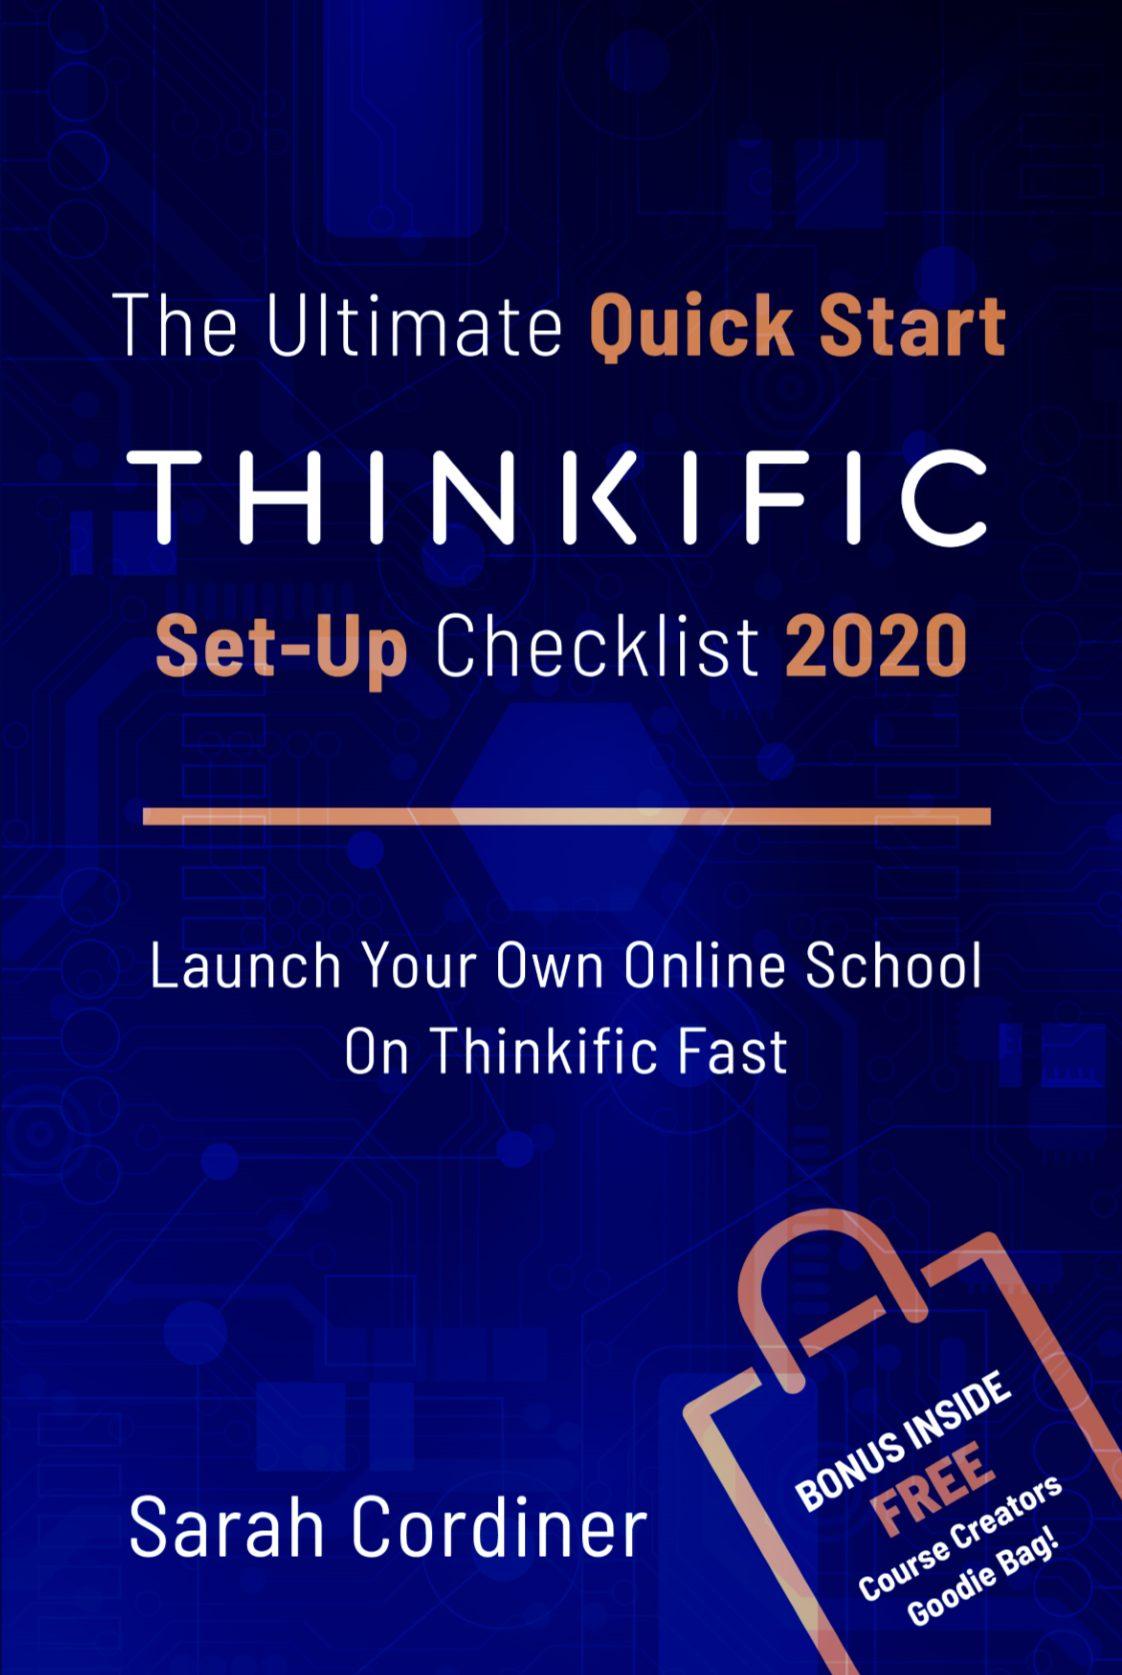 Thinkific Quick Start Guide Checklist - Book Sarah Cordiner